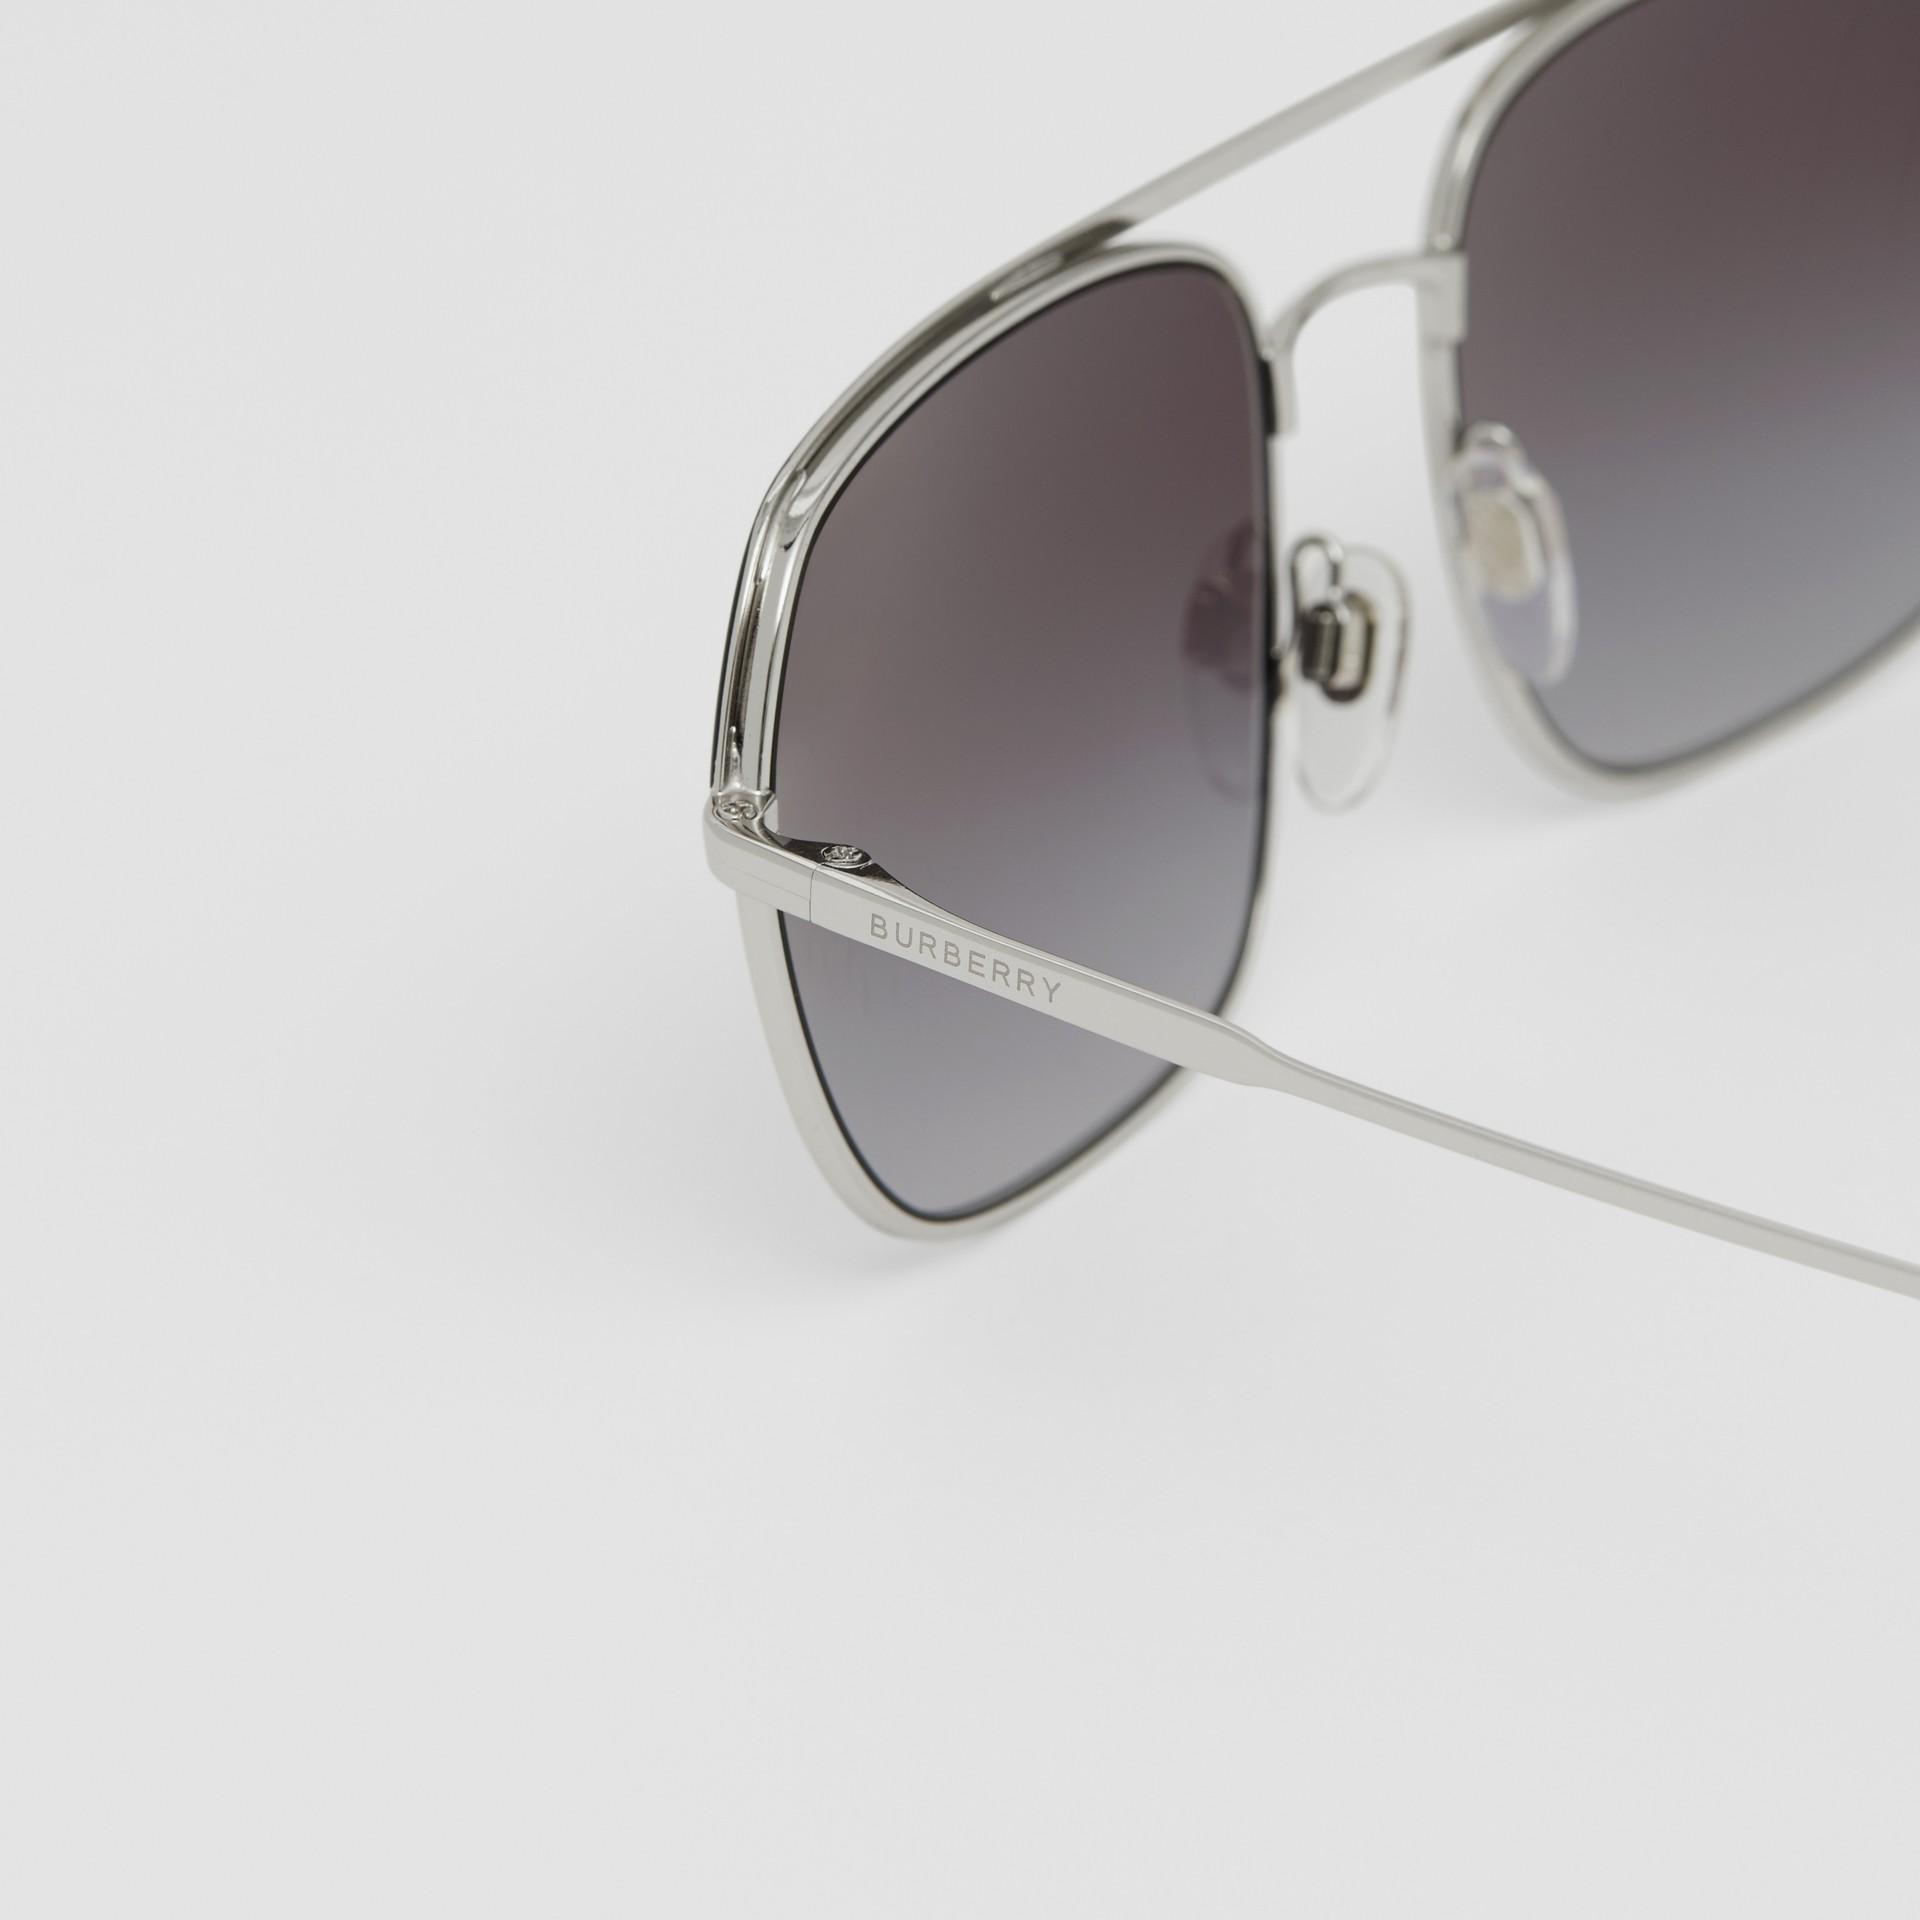 Square Pilot Sunglasses in Black - Men | Burberry - gallery image 1